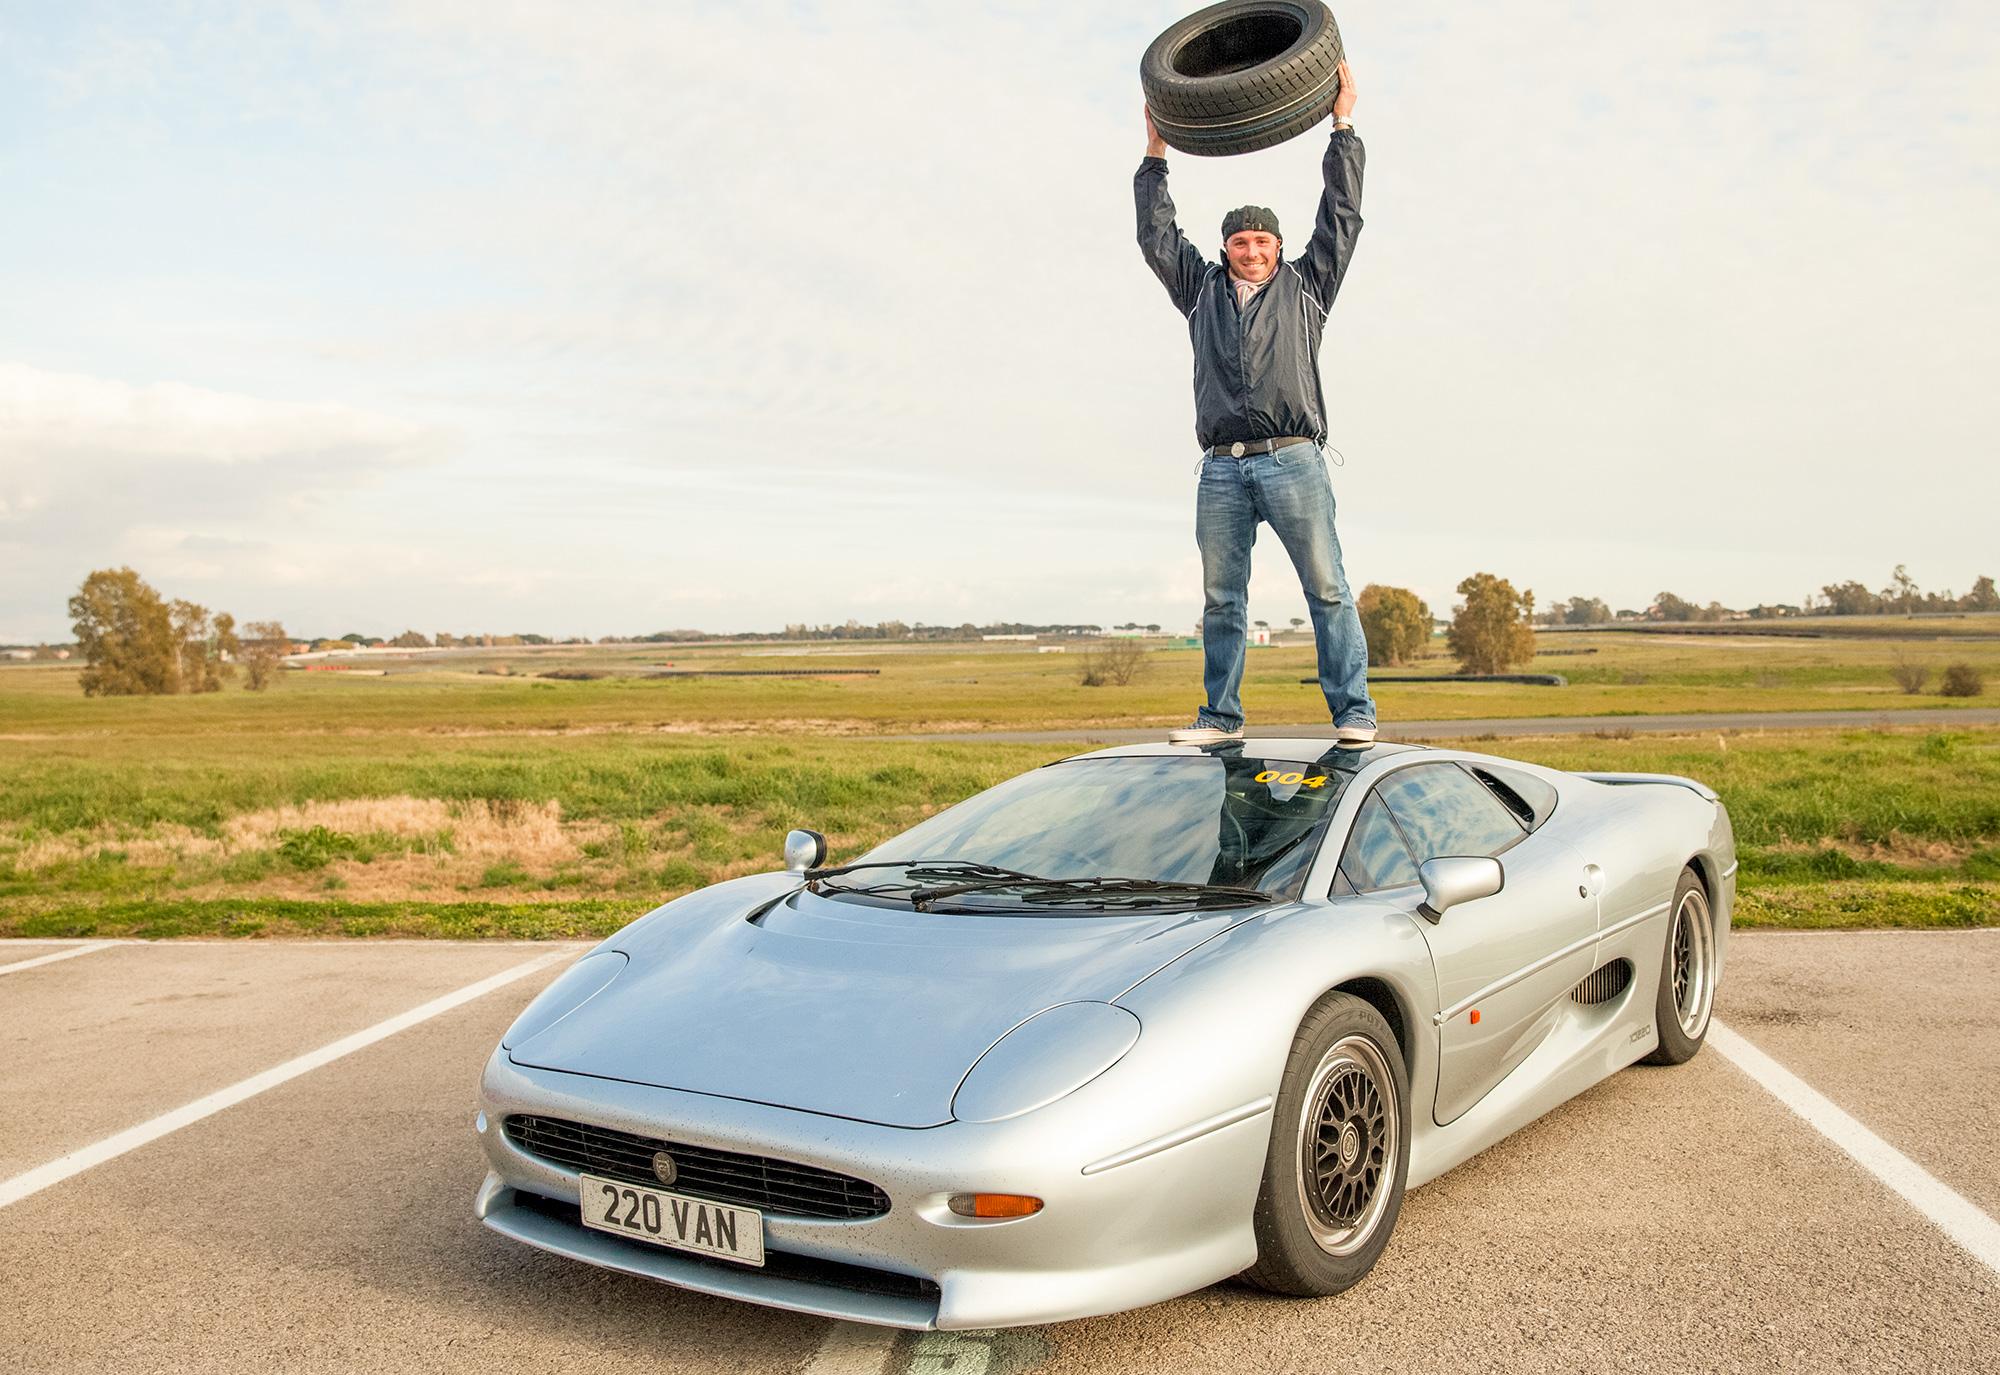 e15ARViJAeXszmB2cn6Xa3FQH4JfMsH0_Justin_Law_celebrates_the_availability_of_the_new_tyre.jpg